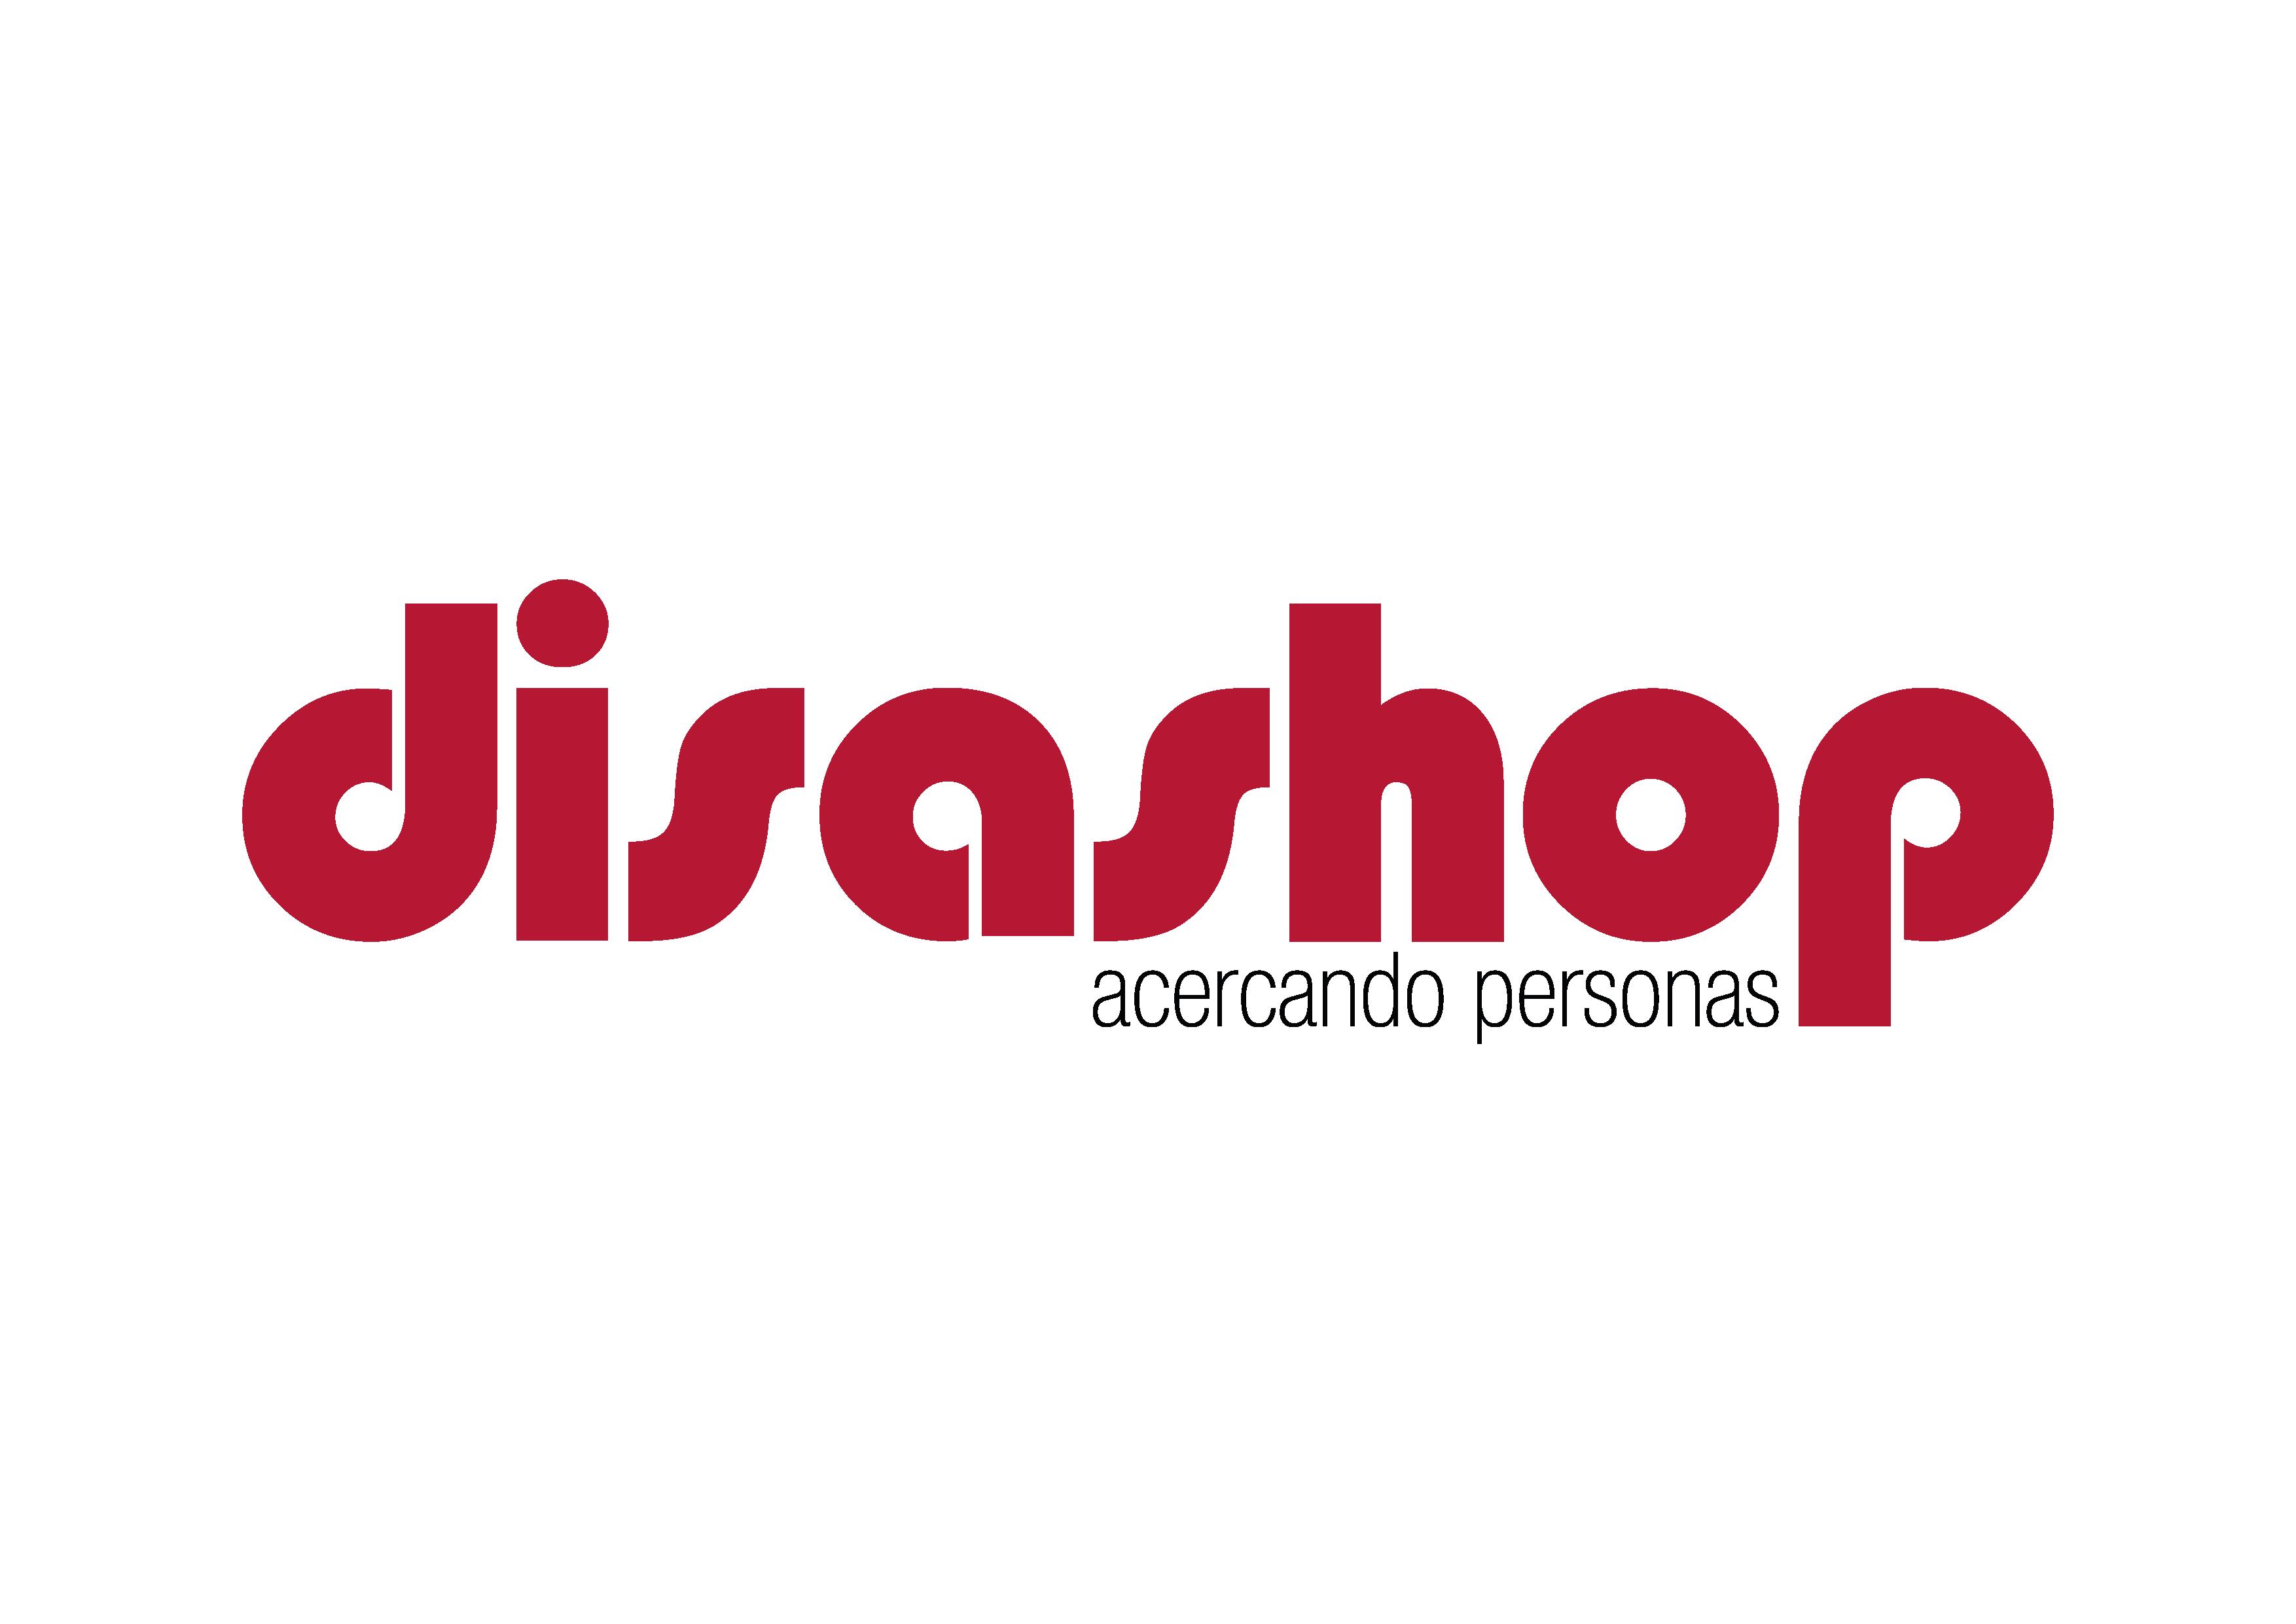 Disashop